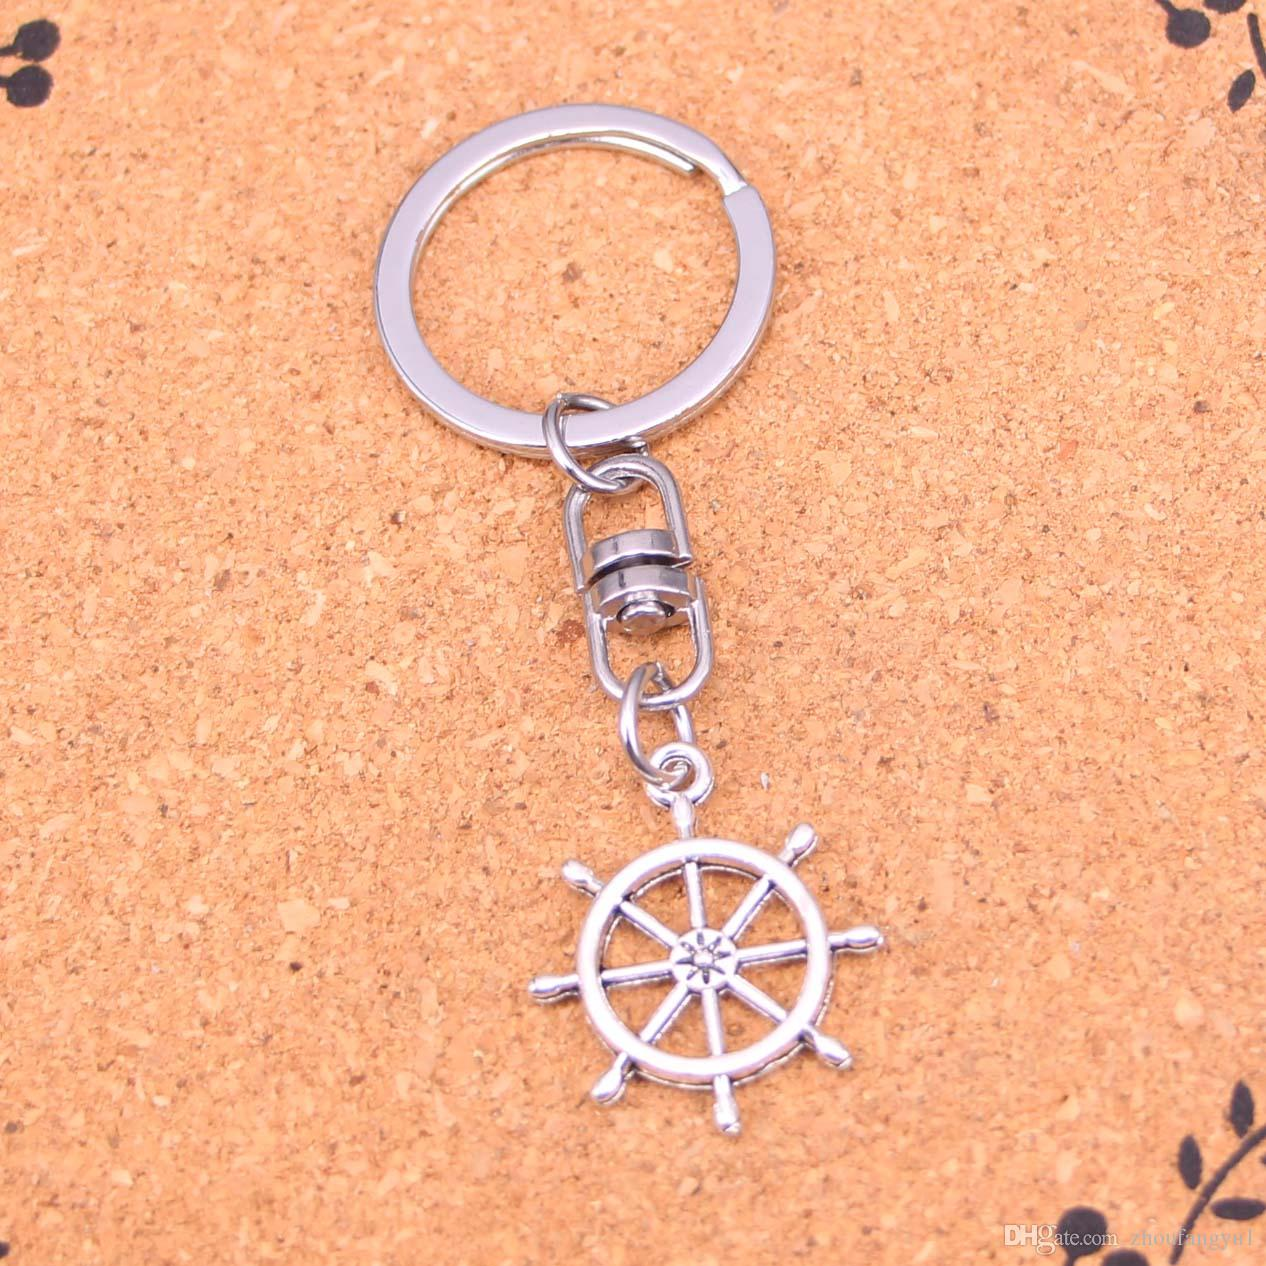 Ankunft Neuheit Souvenir Metall Ruderhelm Schlüsselanhänger Kreative Geschenke Apple Keychain Schlüsselanhänger Schmuckstück Autoschlüssel Ring